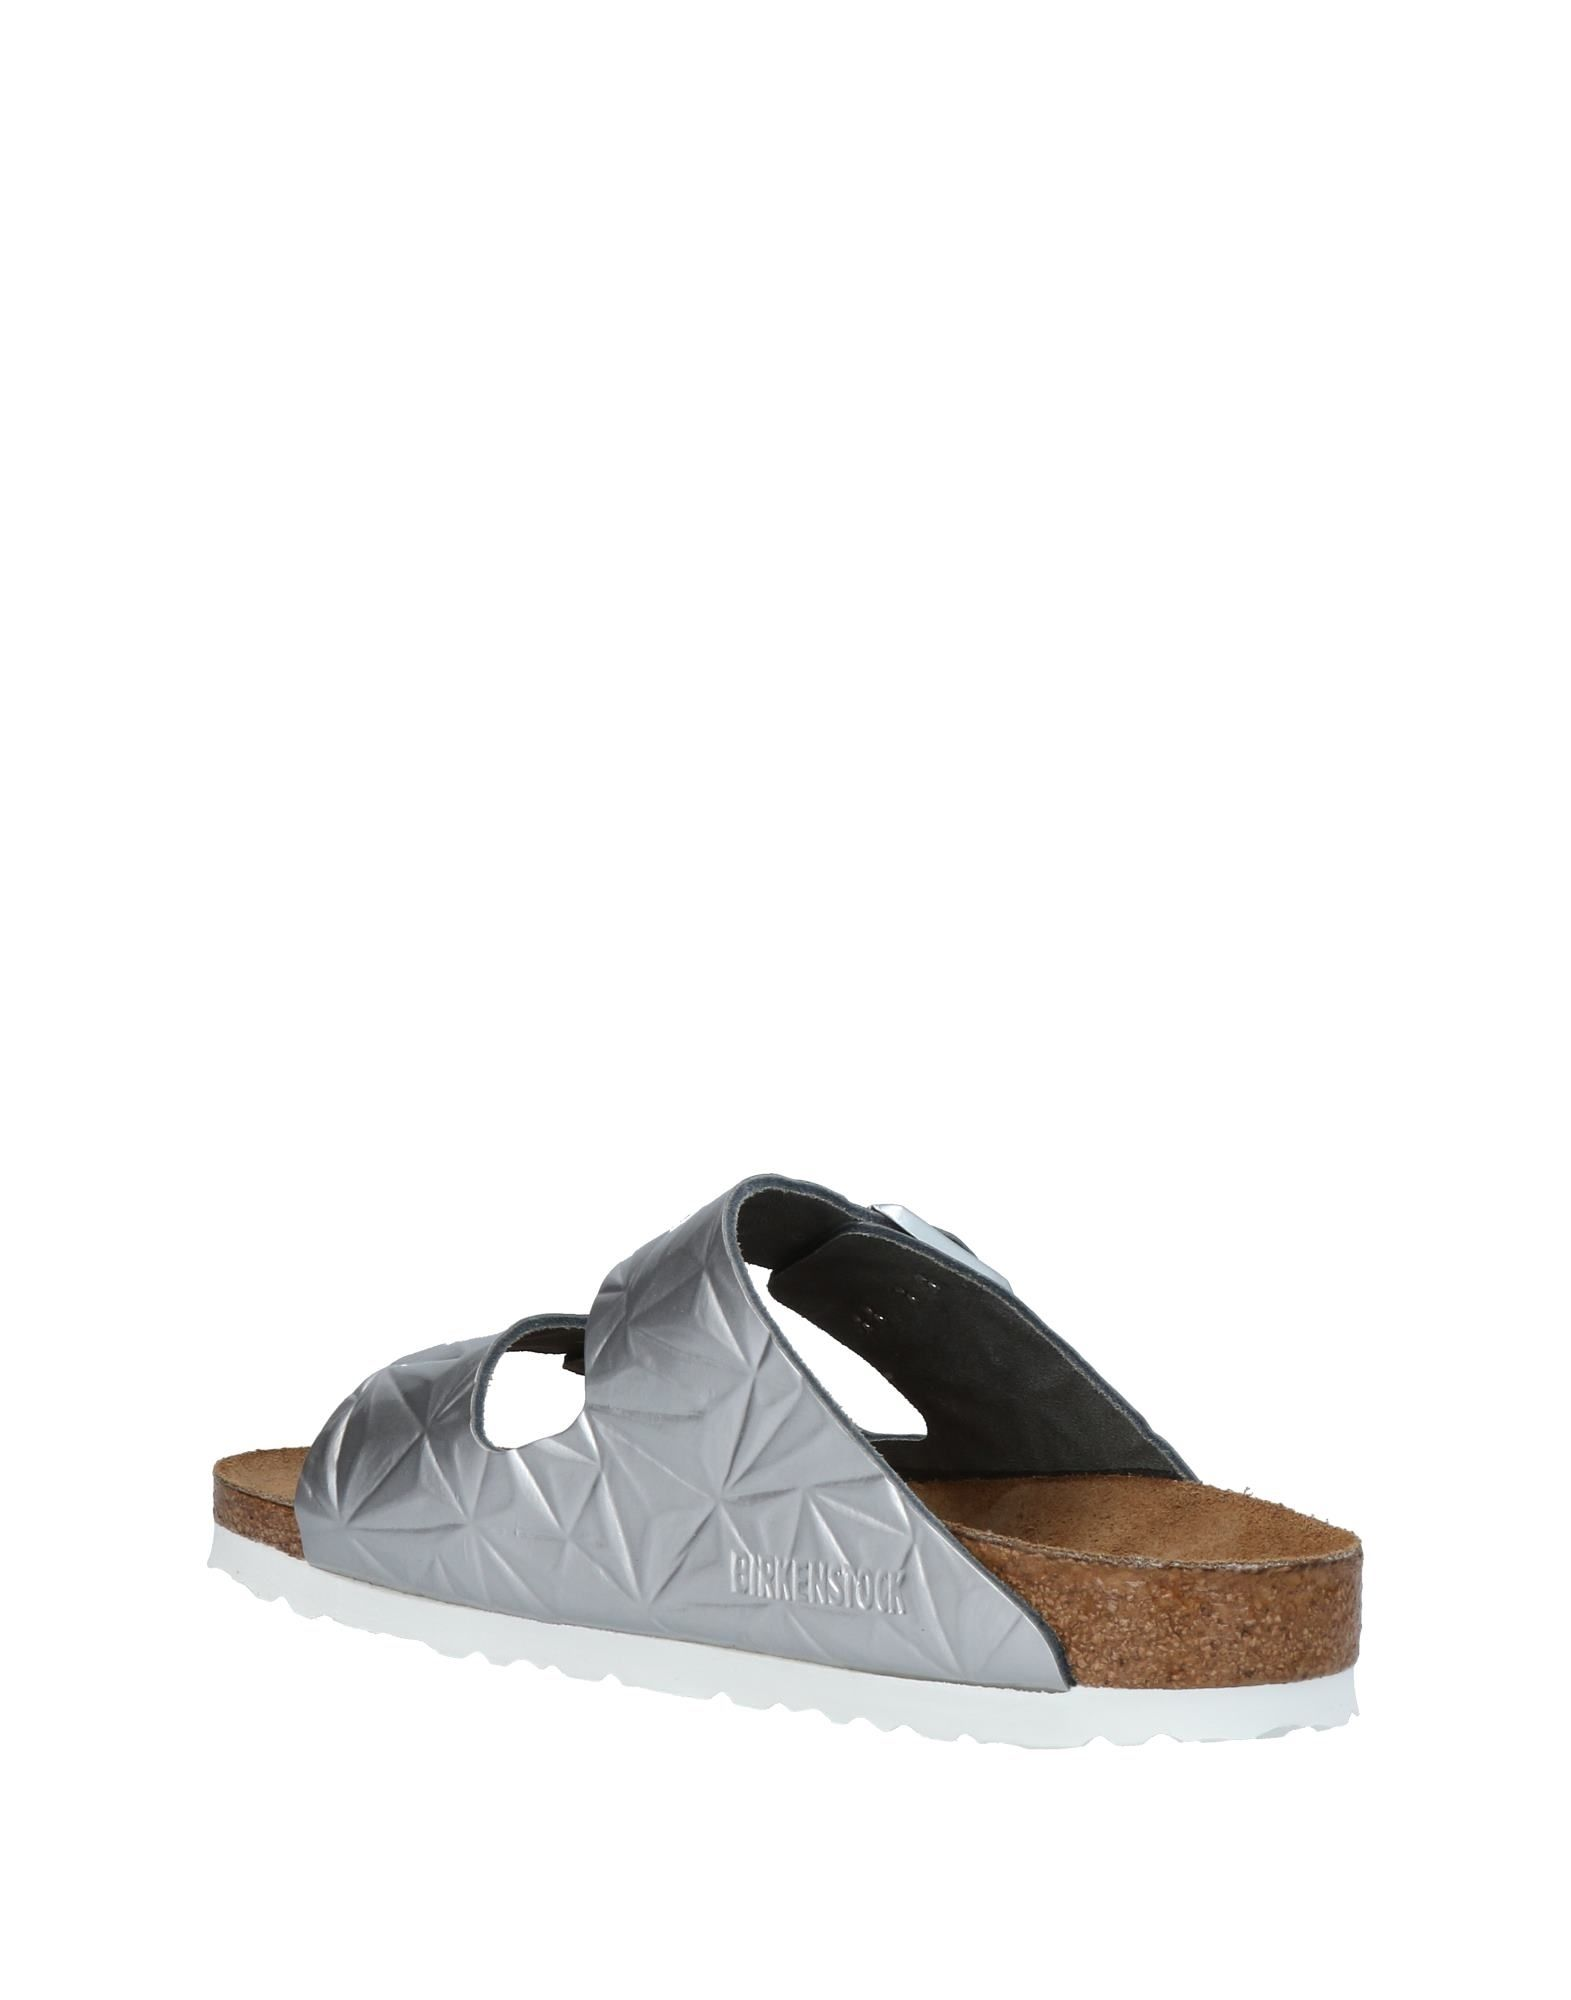 Birkenstock Gute Sandalen Damen  11444095LN Gute Birkenstock Qualität beliebte Schuhe 67057c